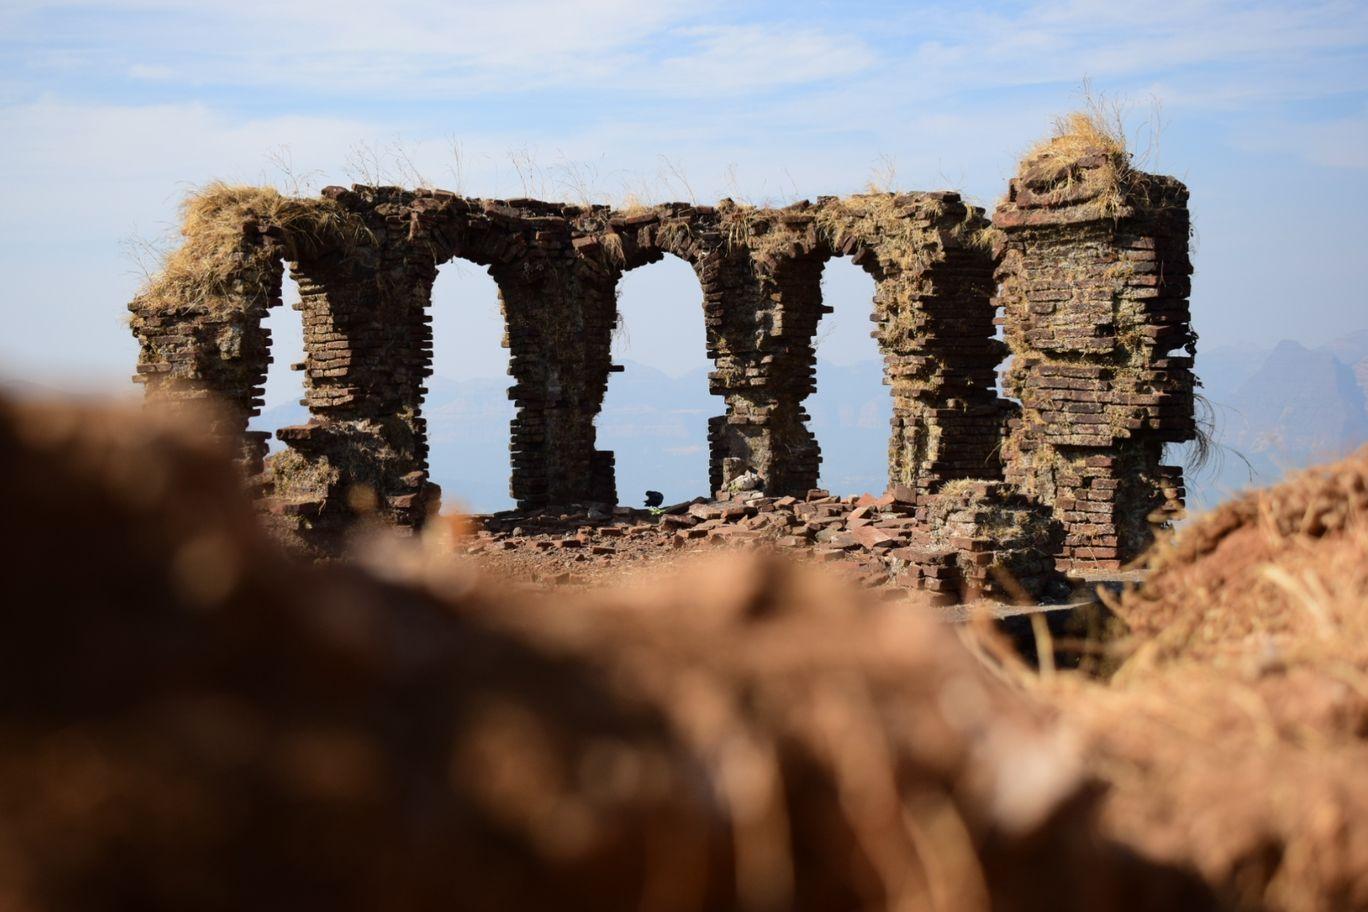 Photo of Raigad Fort By Sanket Patil